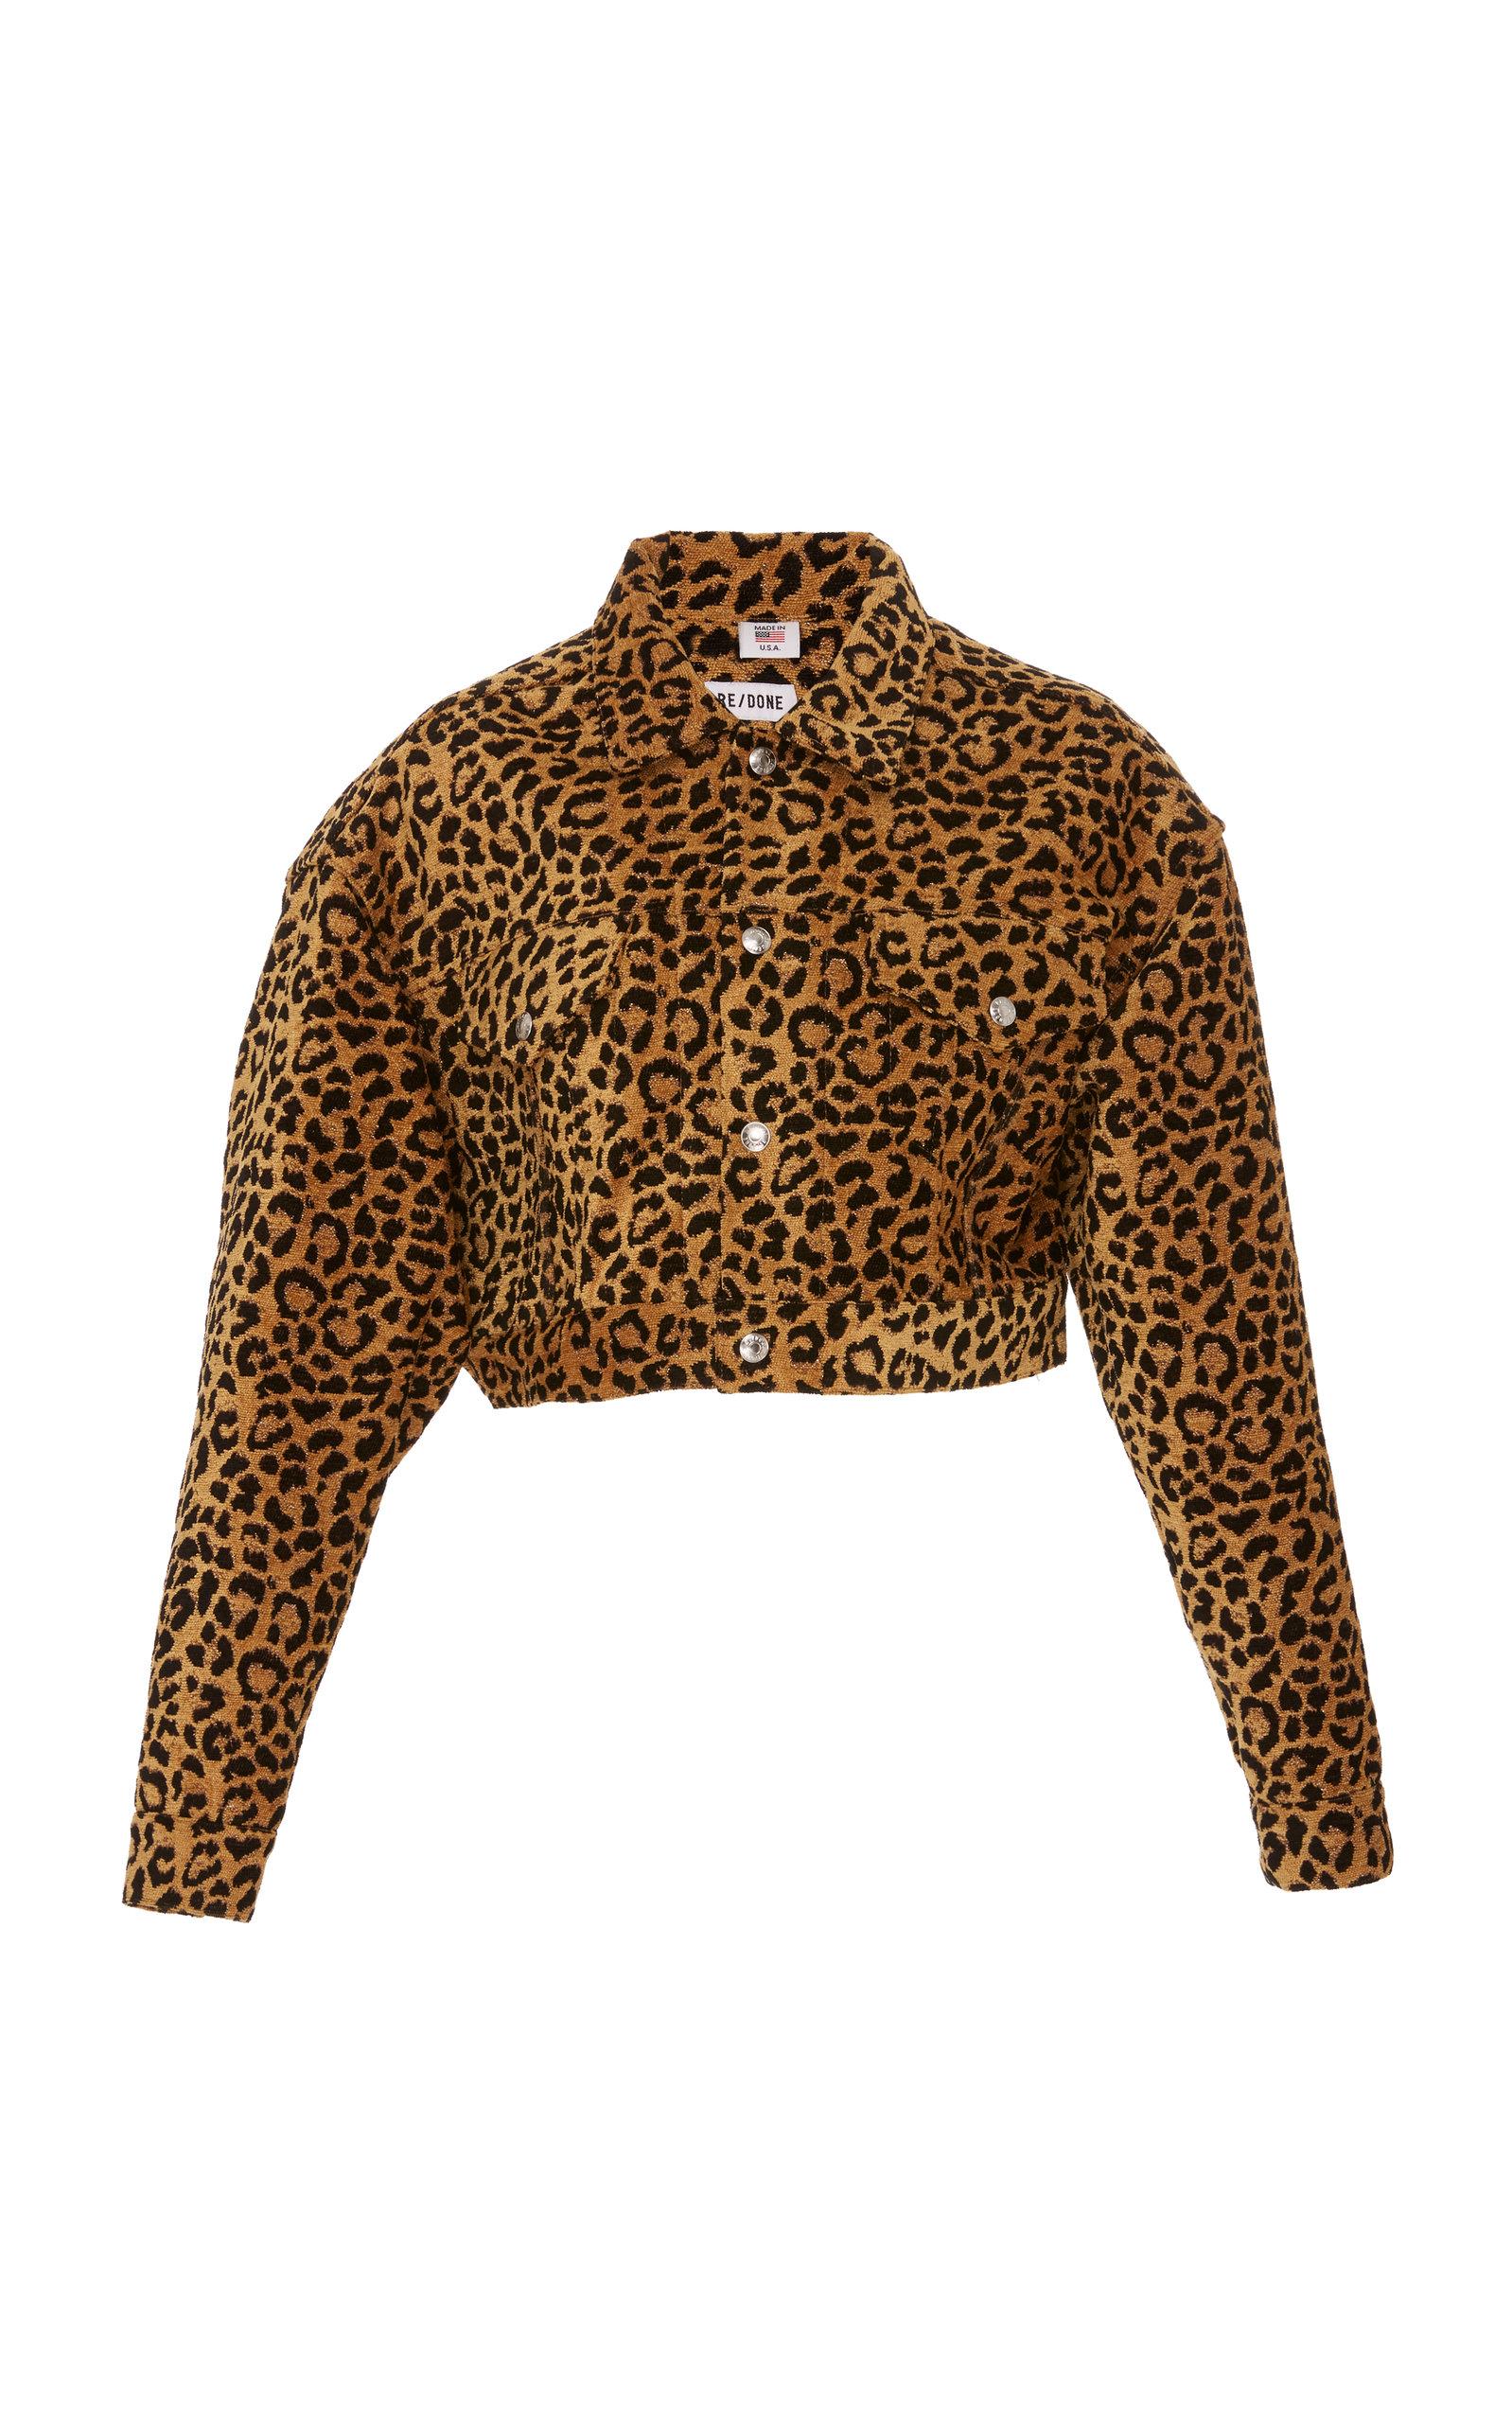 a1bf63b37421 Leopard Cropped Jacket by Re/done | Moda Operandi